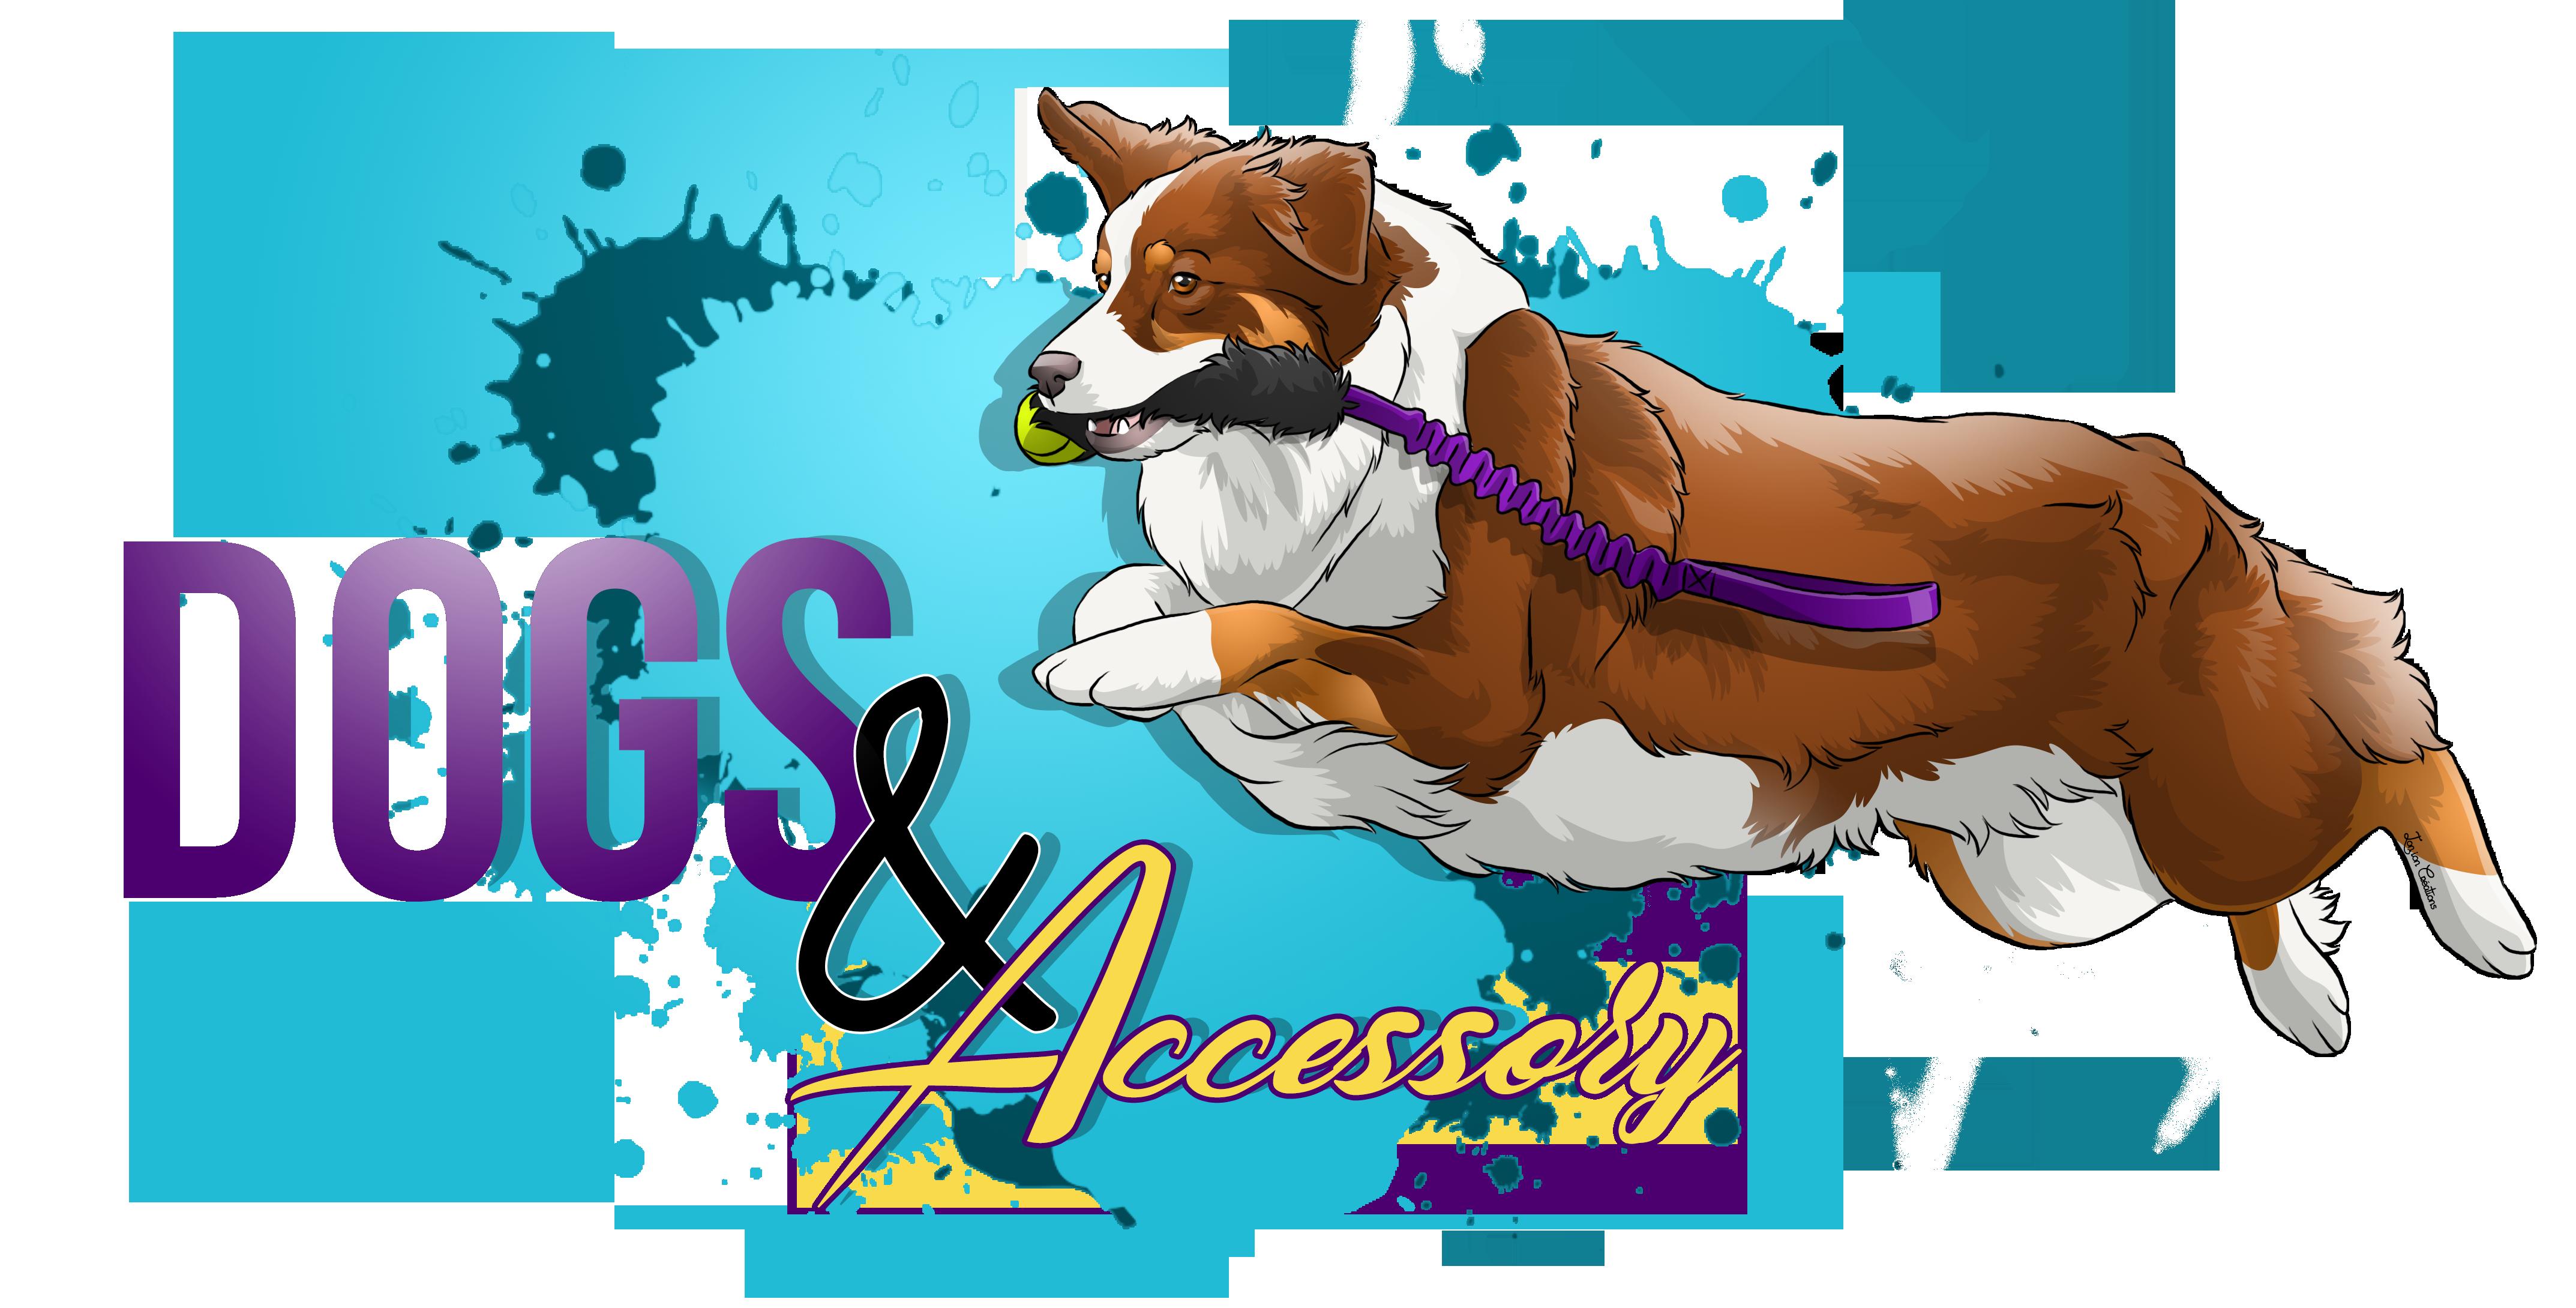 Dogs Accessory